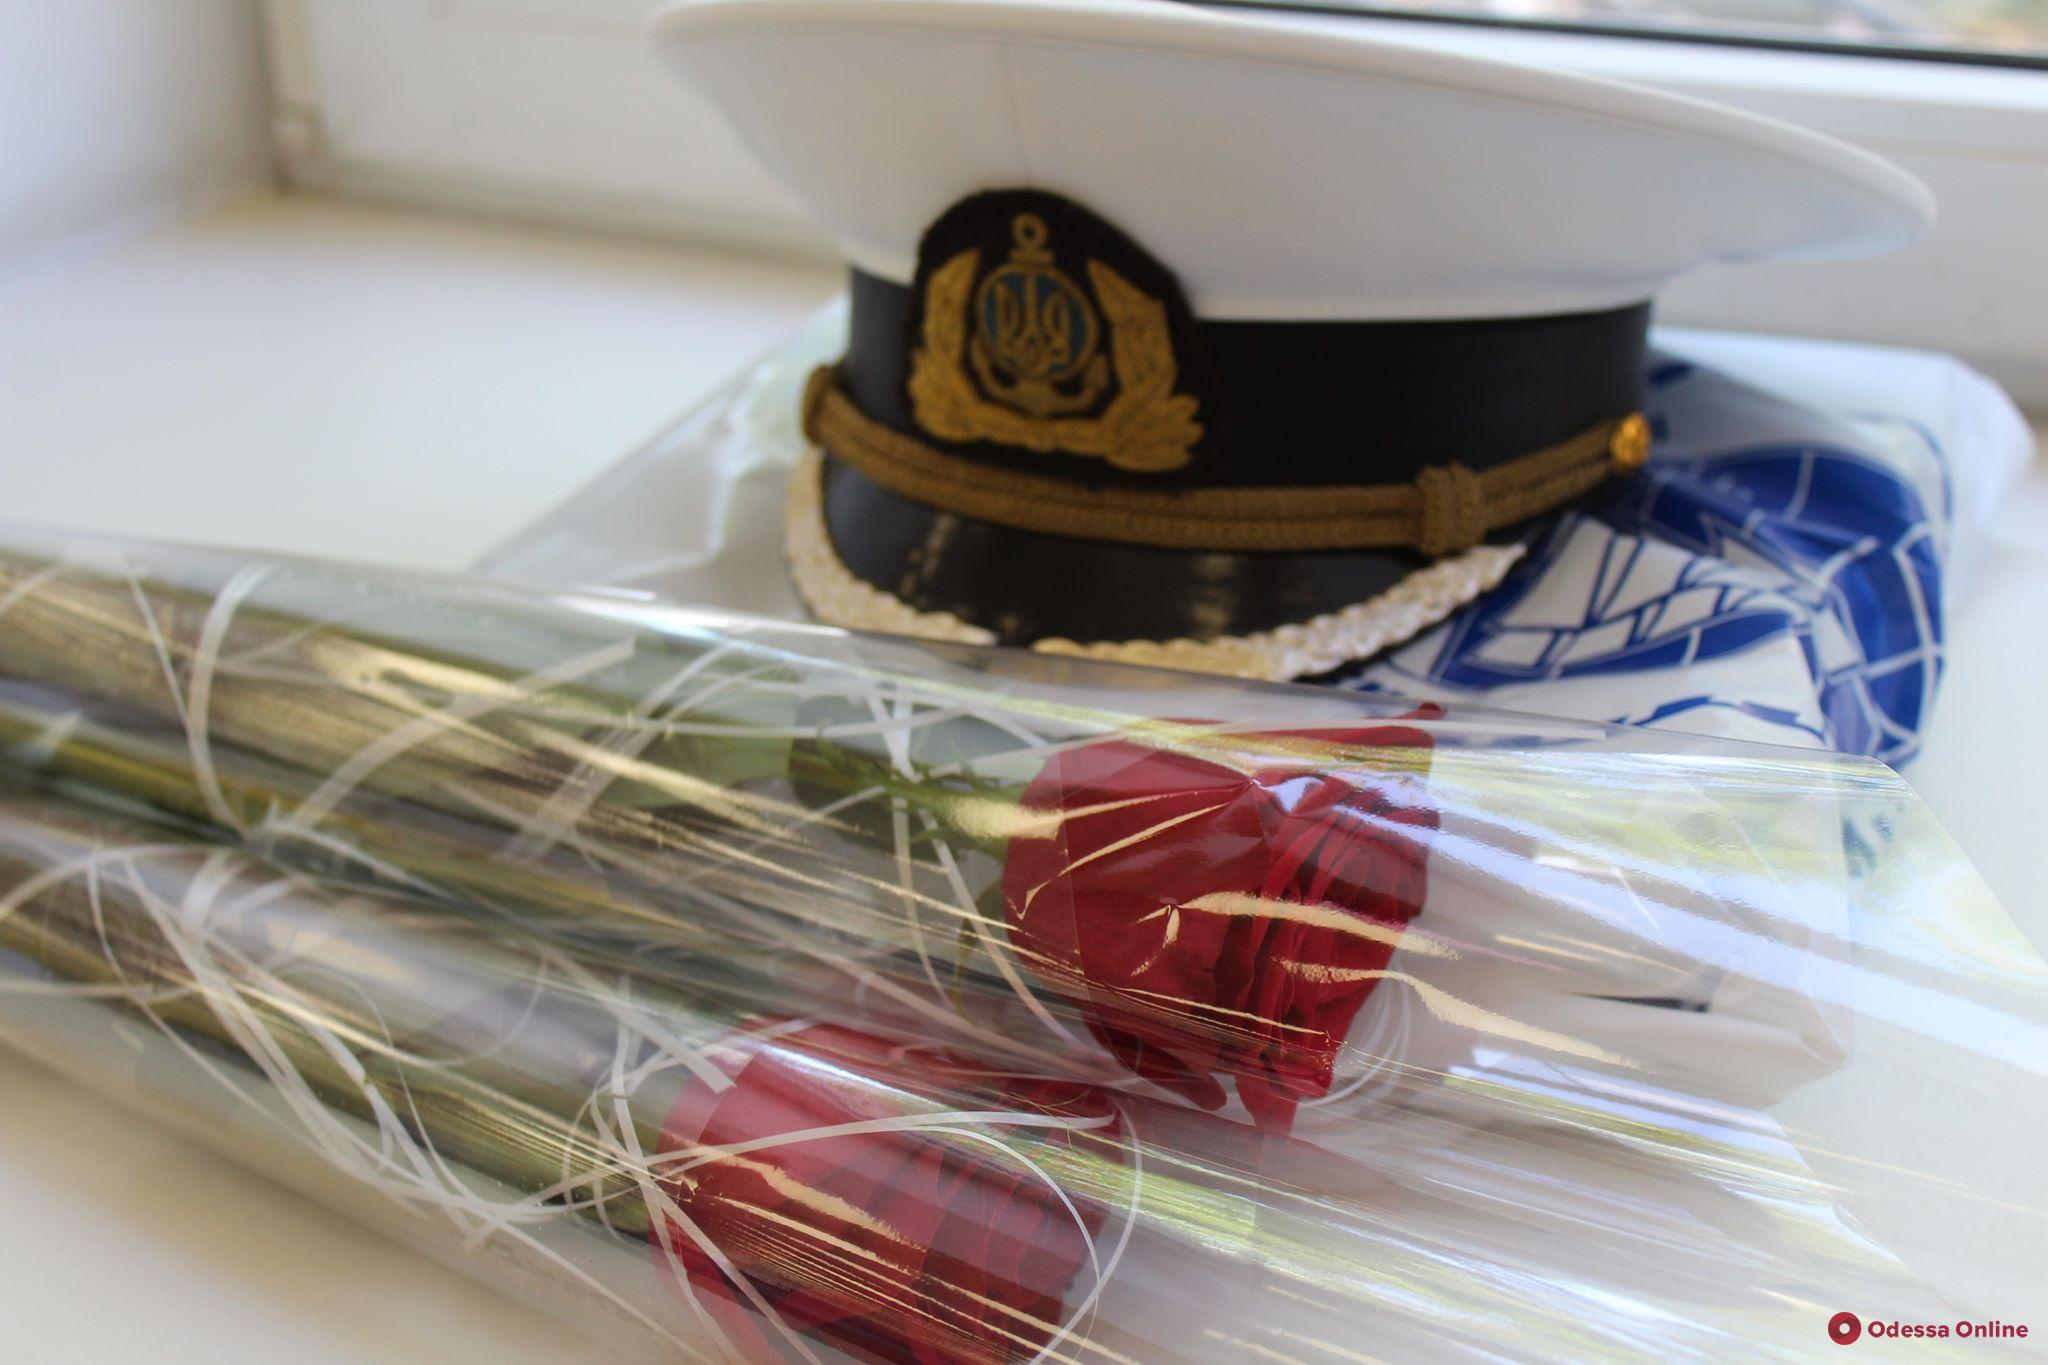 В Одессе отметили 75-летие морской академии (фото)